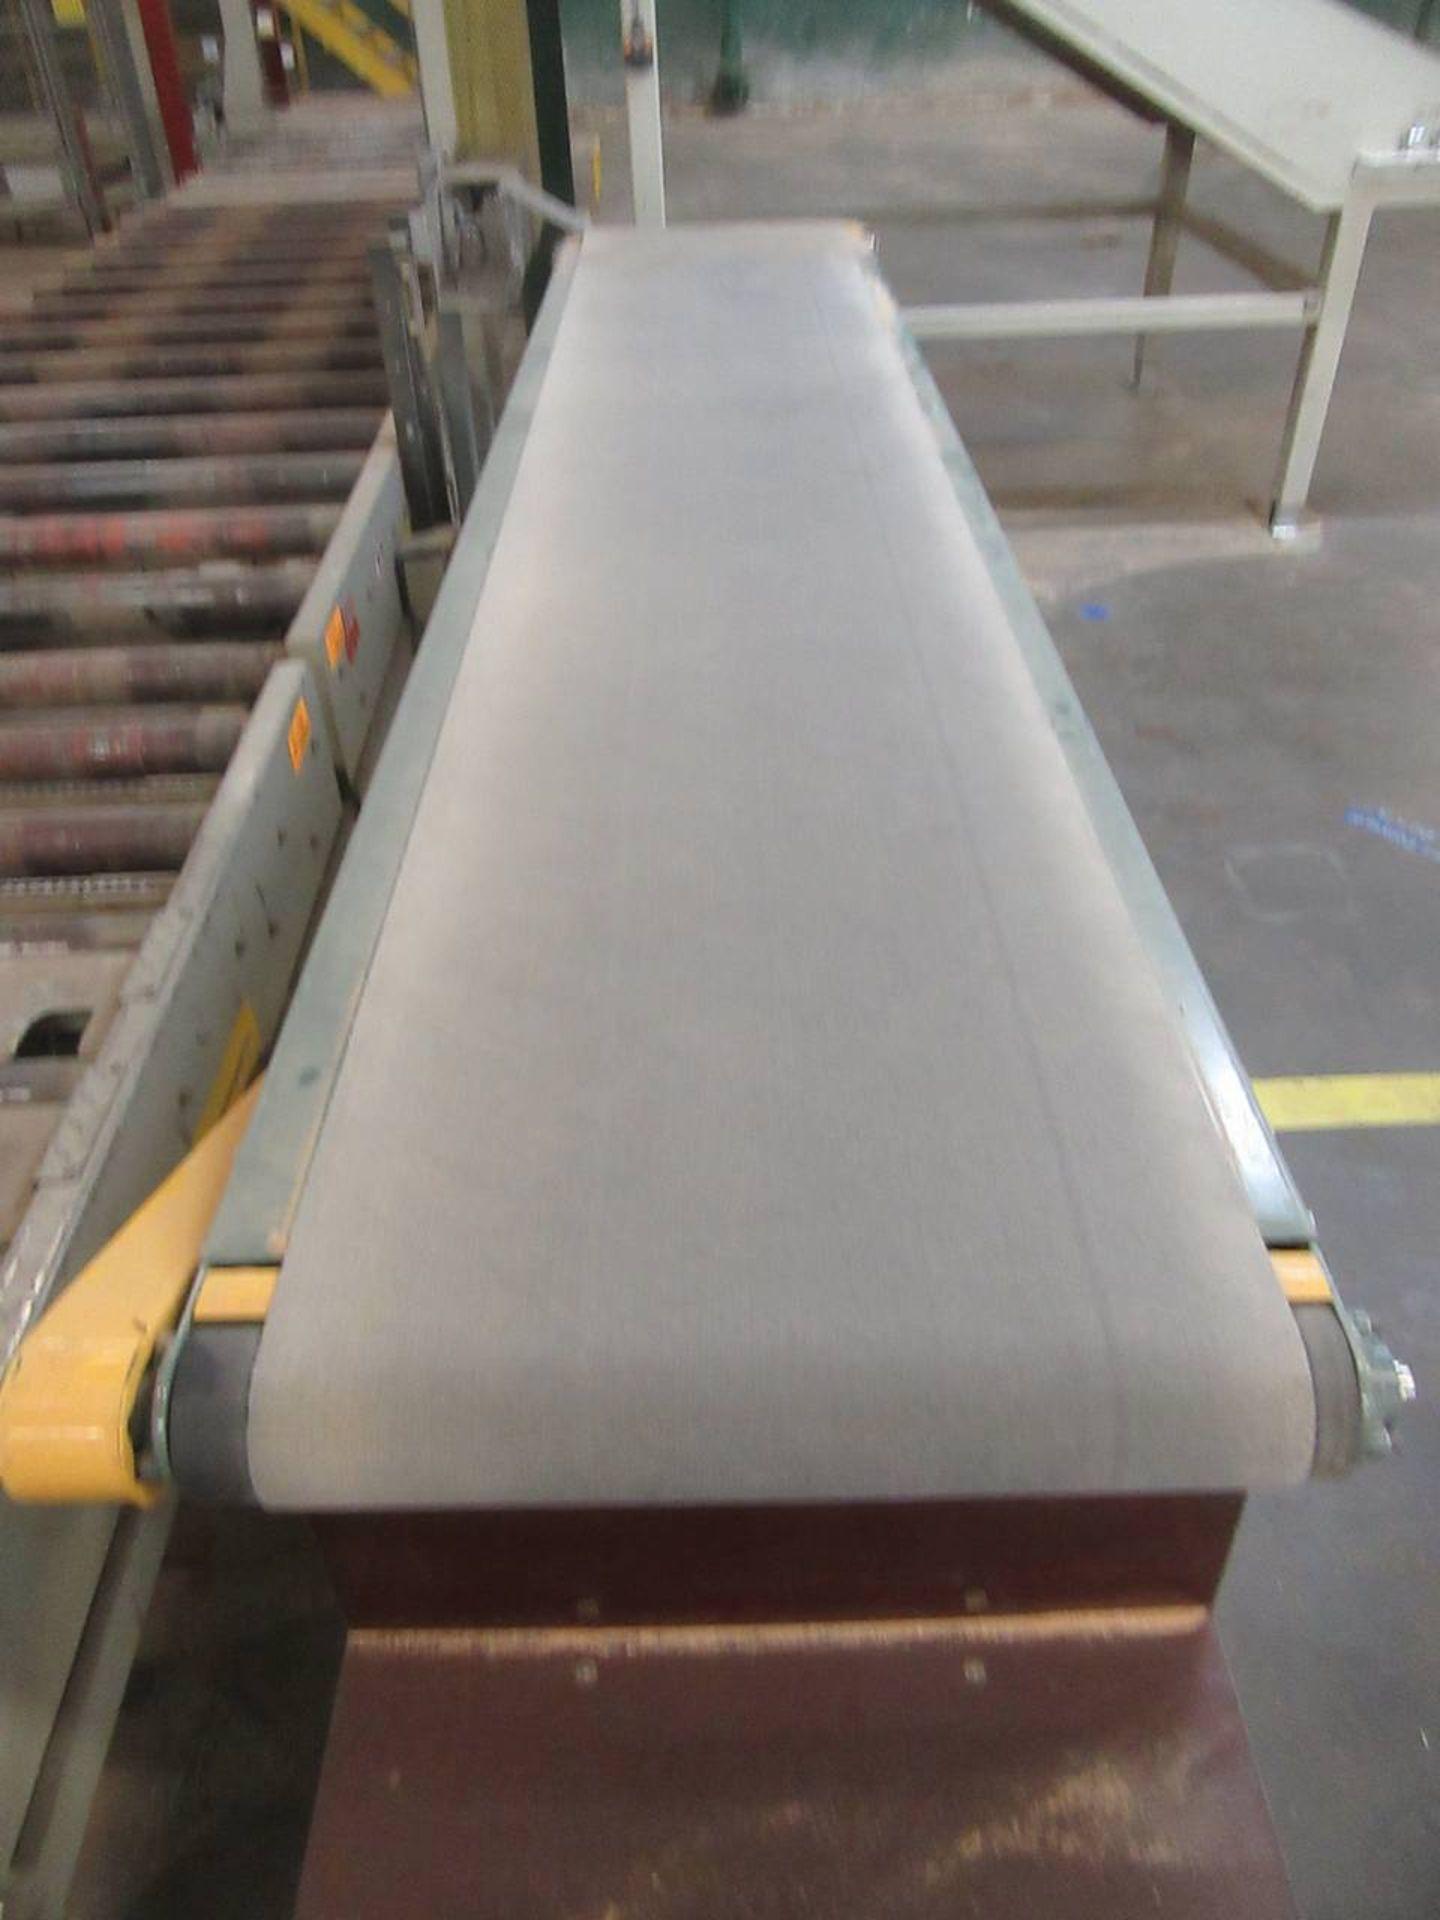 Lot 22 - Hytrol TA Belt Conveyor